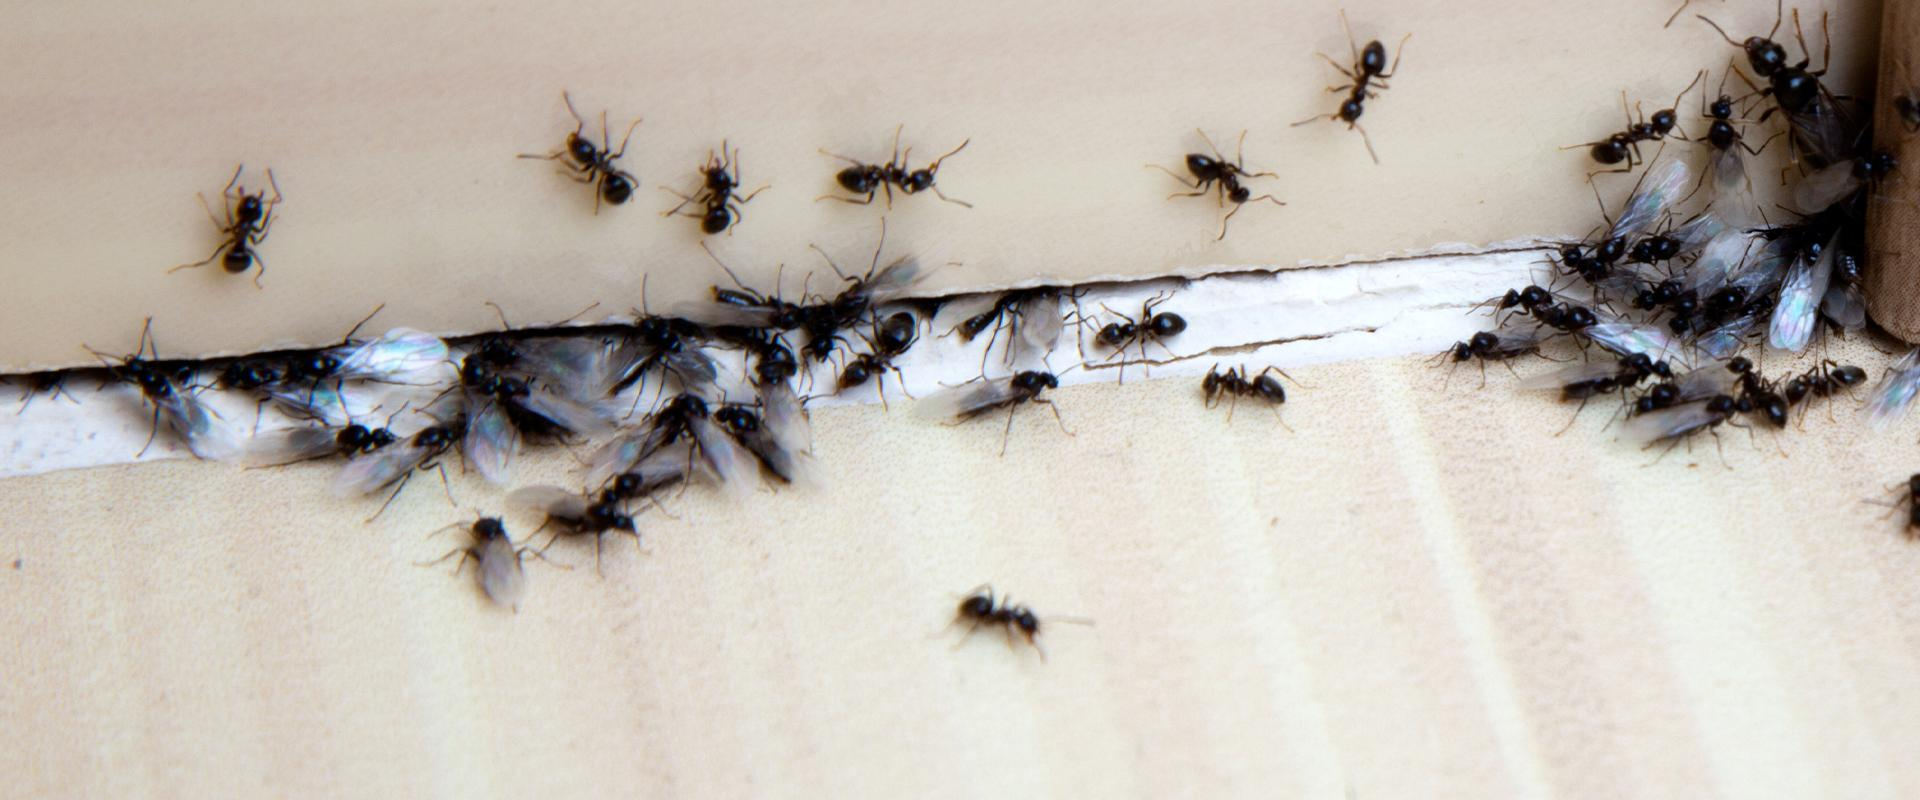 ants on the floor